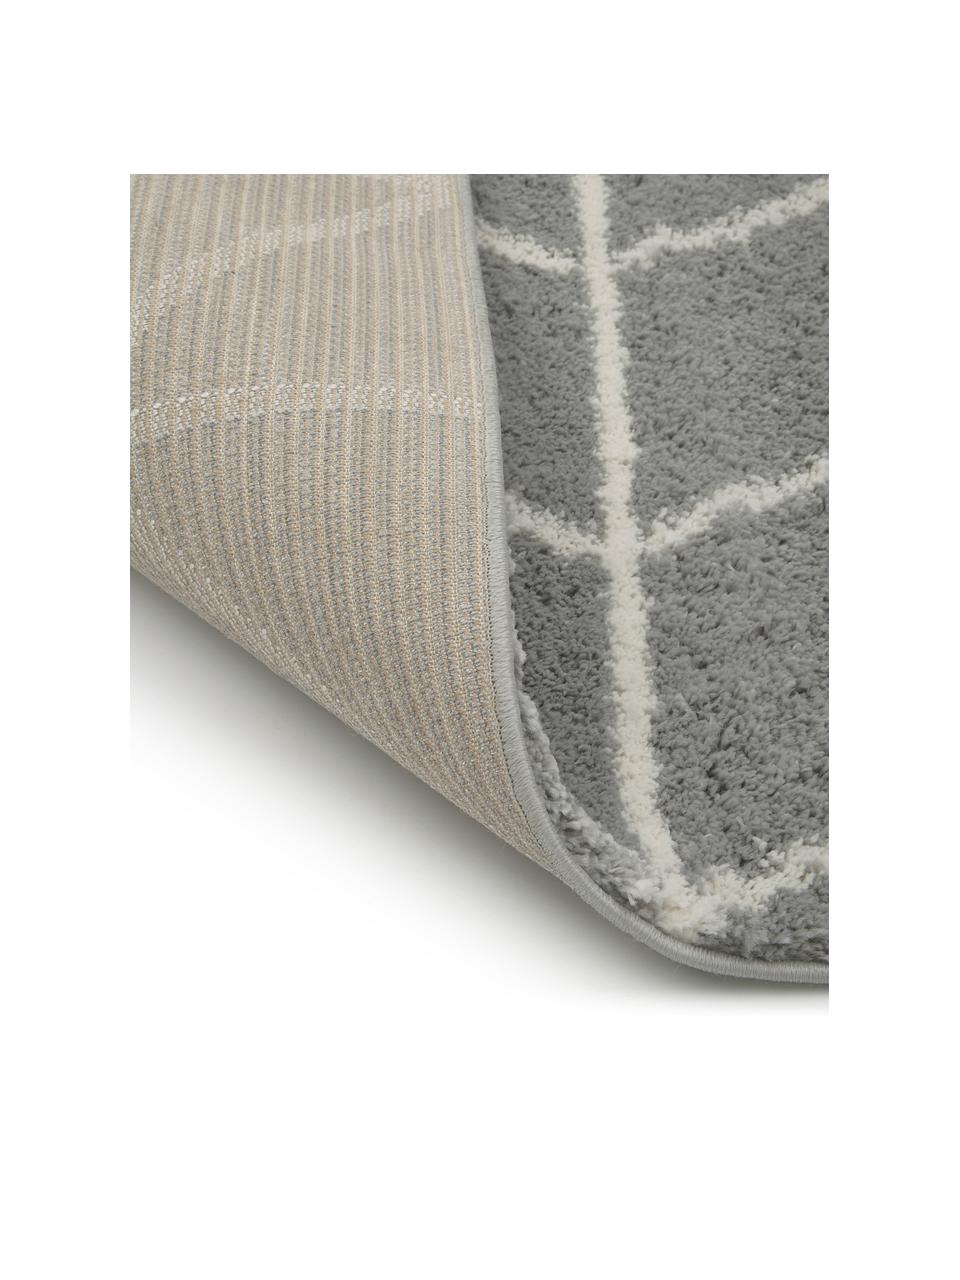 Passatoia a pelo lungo grigio/bianco crema Cera, Retro: 78% juta, 14% cotone, 8% , Grigio, bianco crema, Larg. 80 x Lung. 250 cm